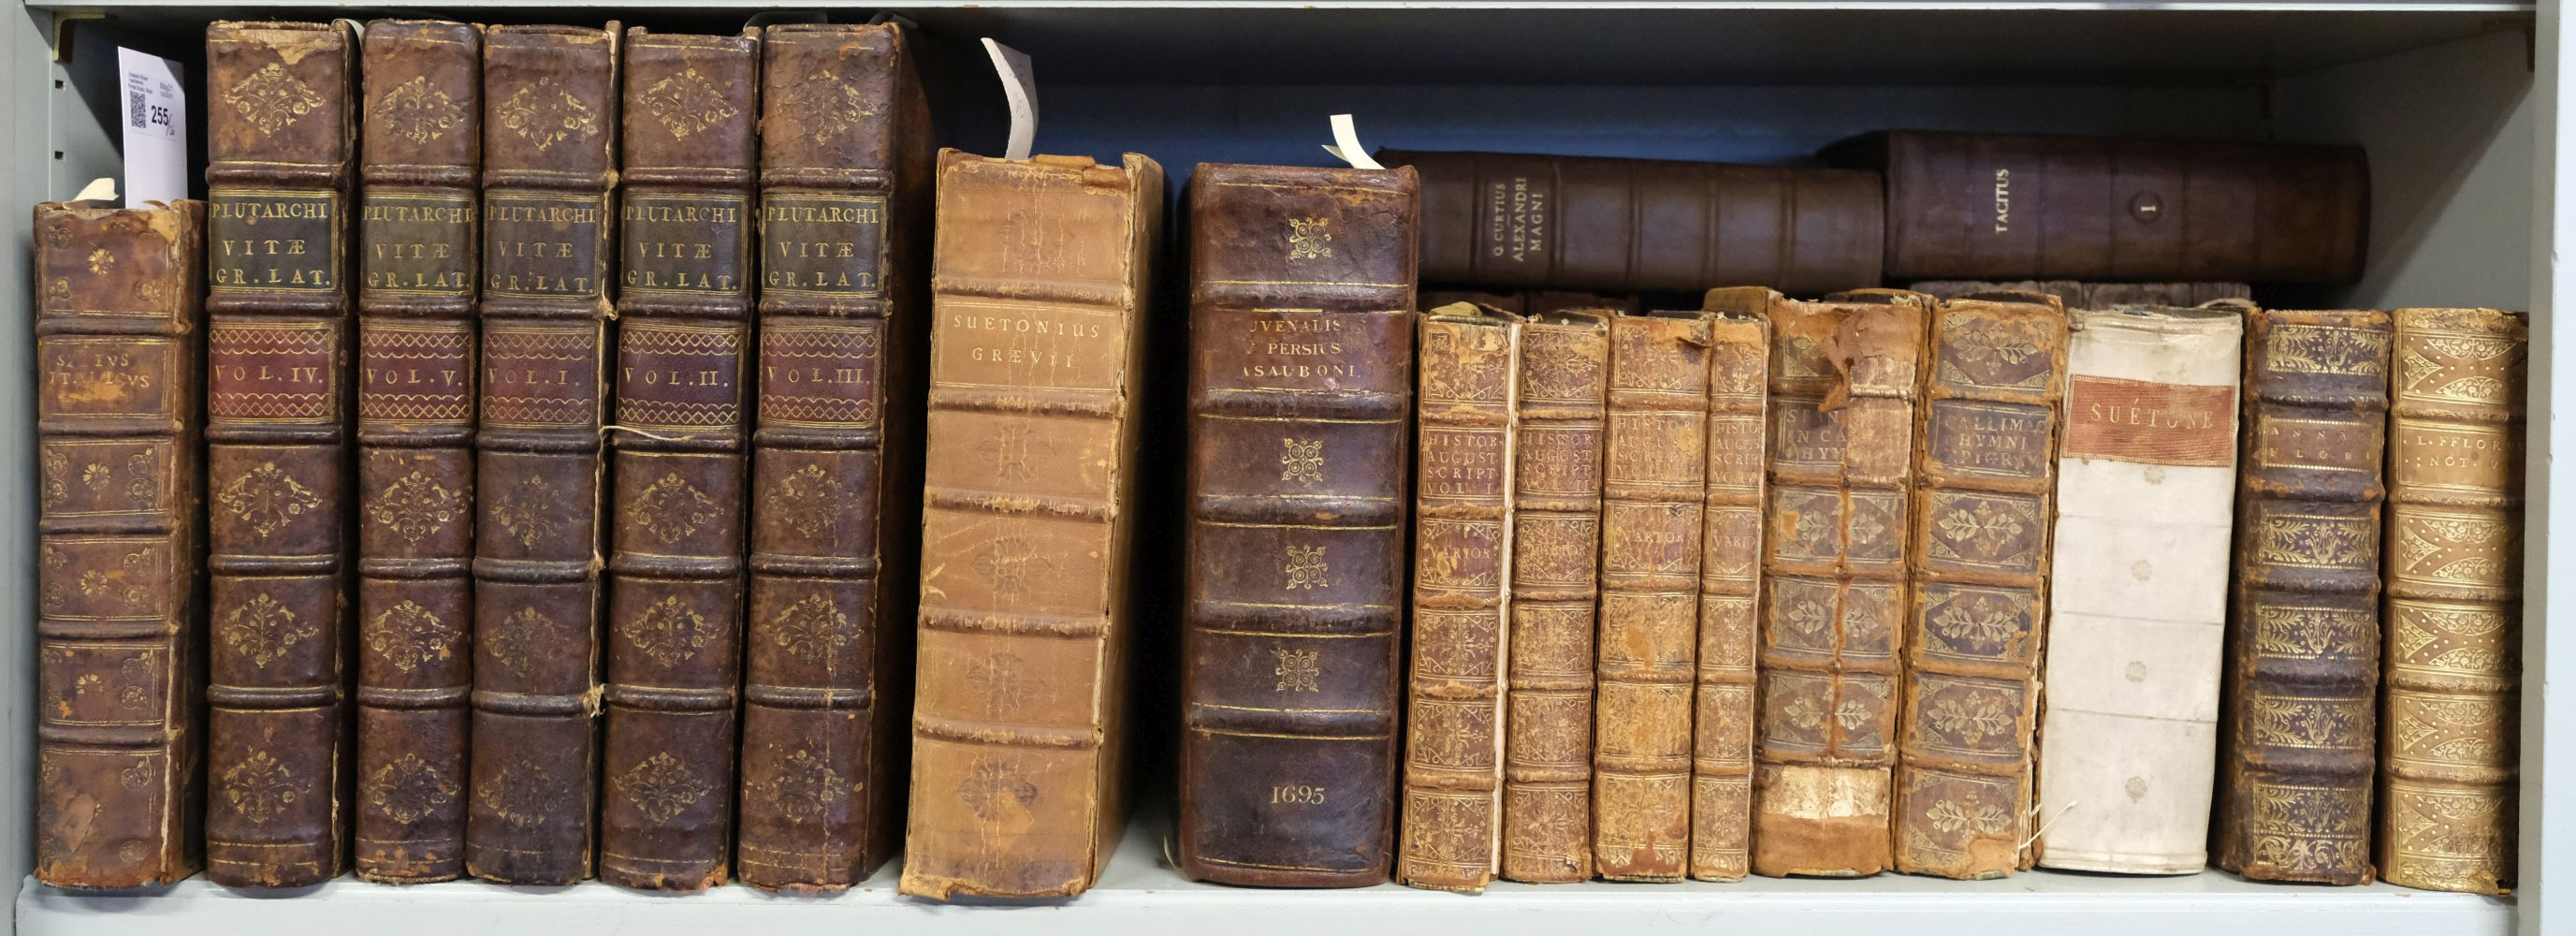 Plutarch. Plutarchi Chaeronensis Vitae Parallelae,..., 5 volumes, London: Tonson & Watts, 1729